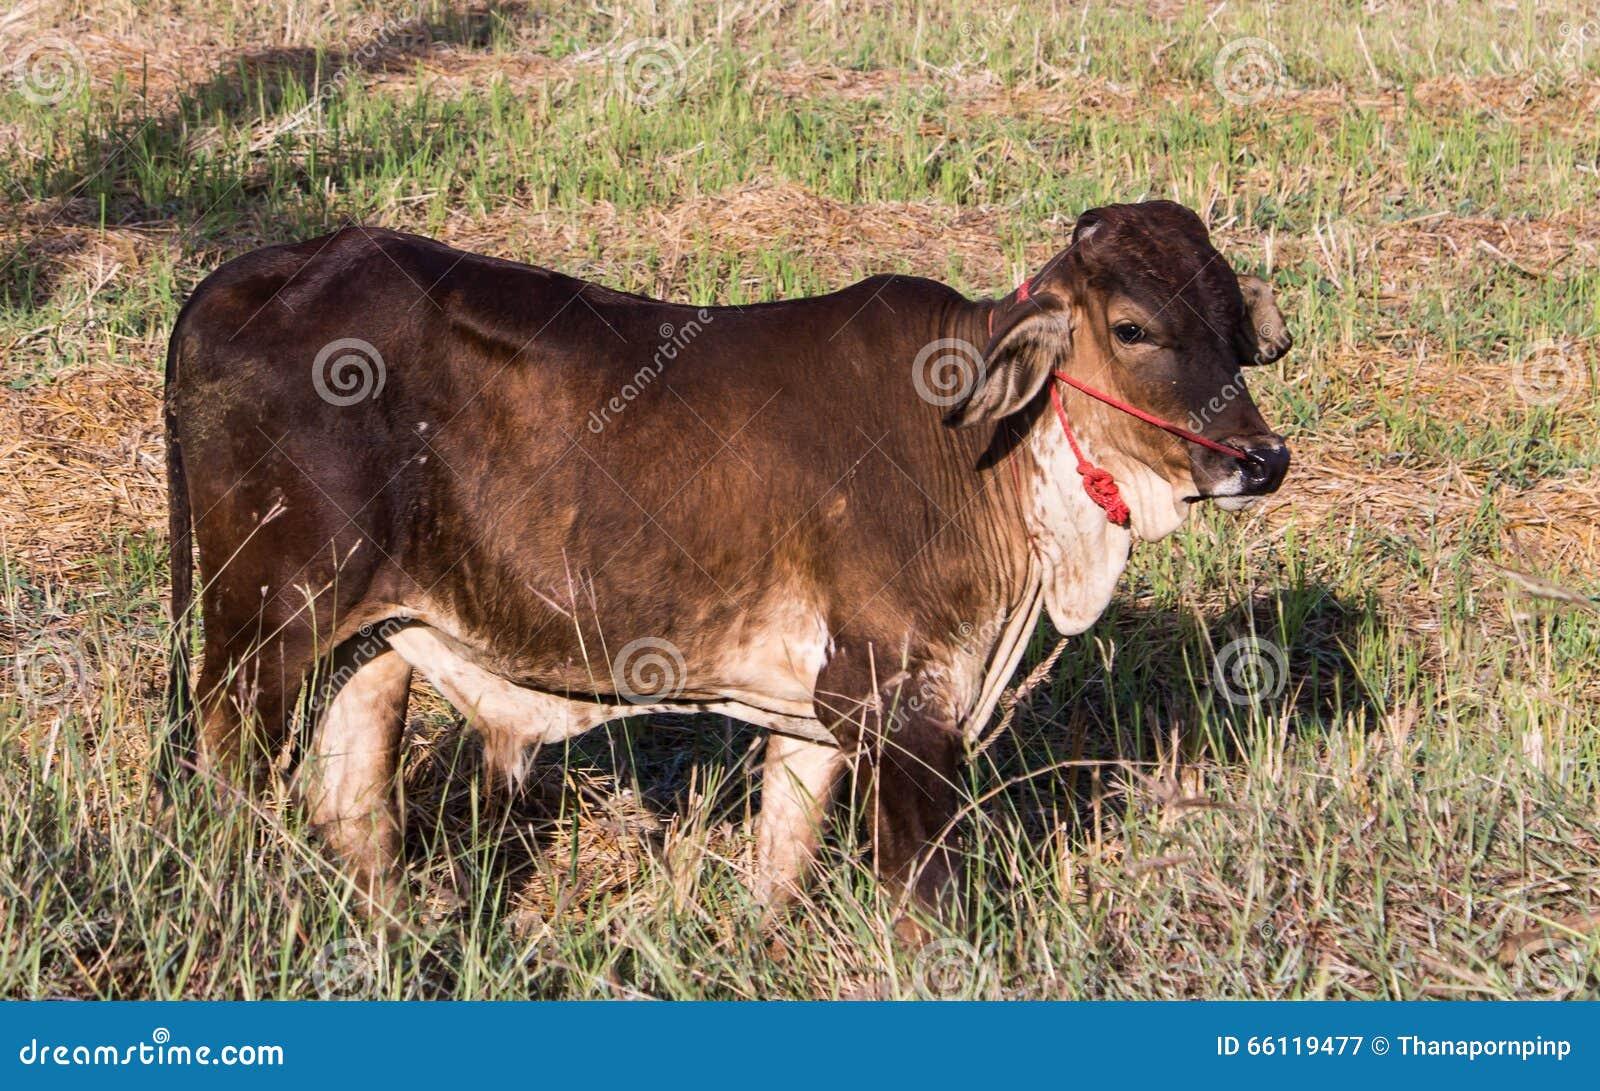 brown ox stock image image of close brown milk tropical 66119477. Black Bedroom Furniture Sets. Home Design Ideas